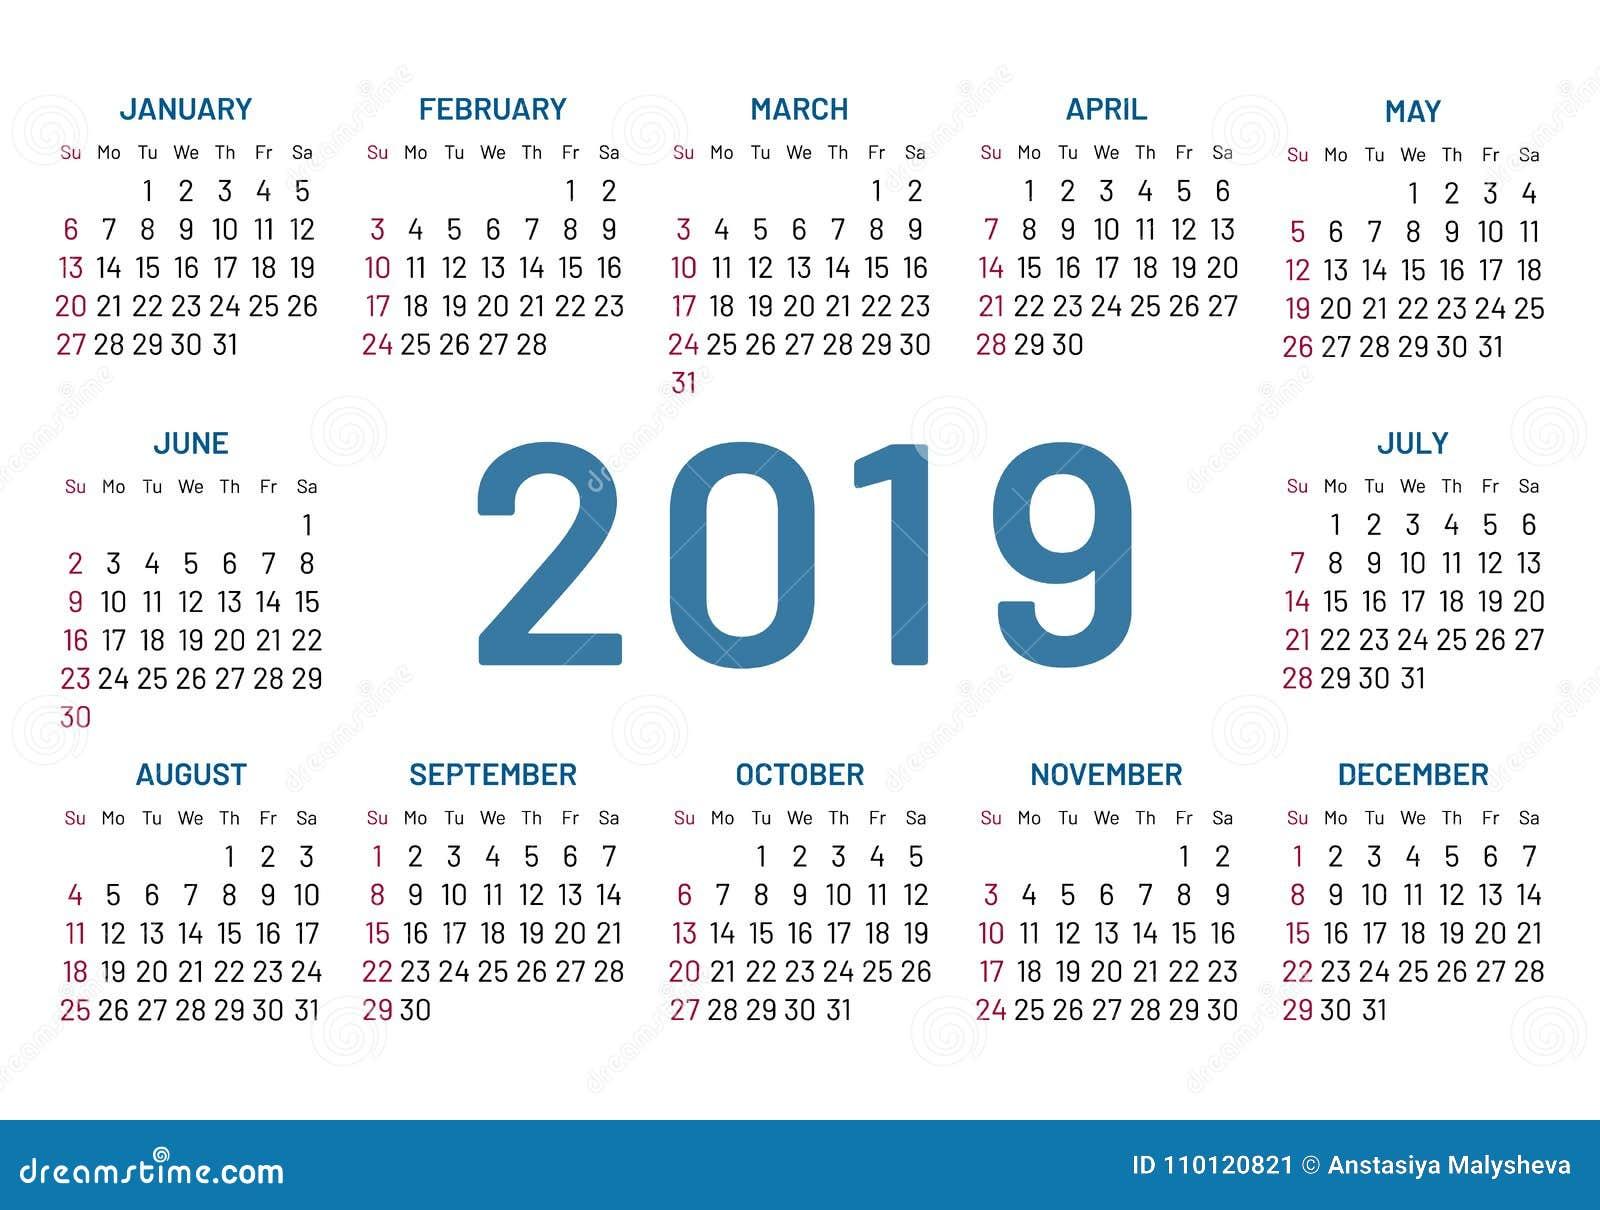 Calendrier De Poche 2019.Calendrier Simple De Poche 2019 Centre Annee Plat D